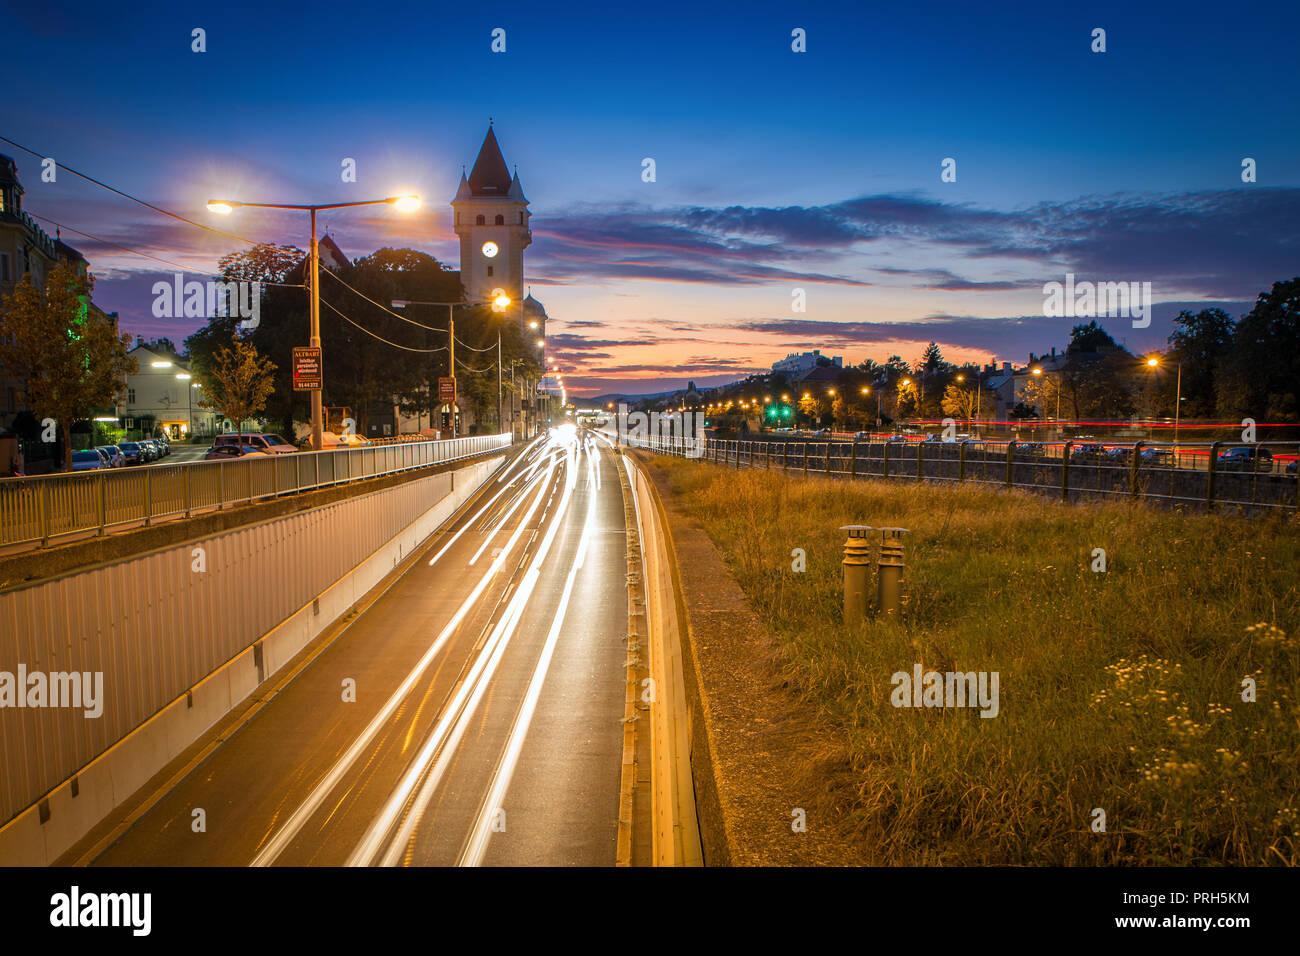 Sonnenuntergang Kennedybrücke Wien Hietzing im Spätsommer - Stock Image